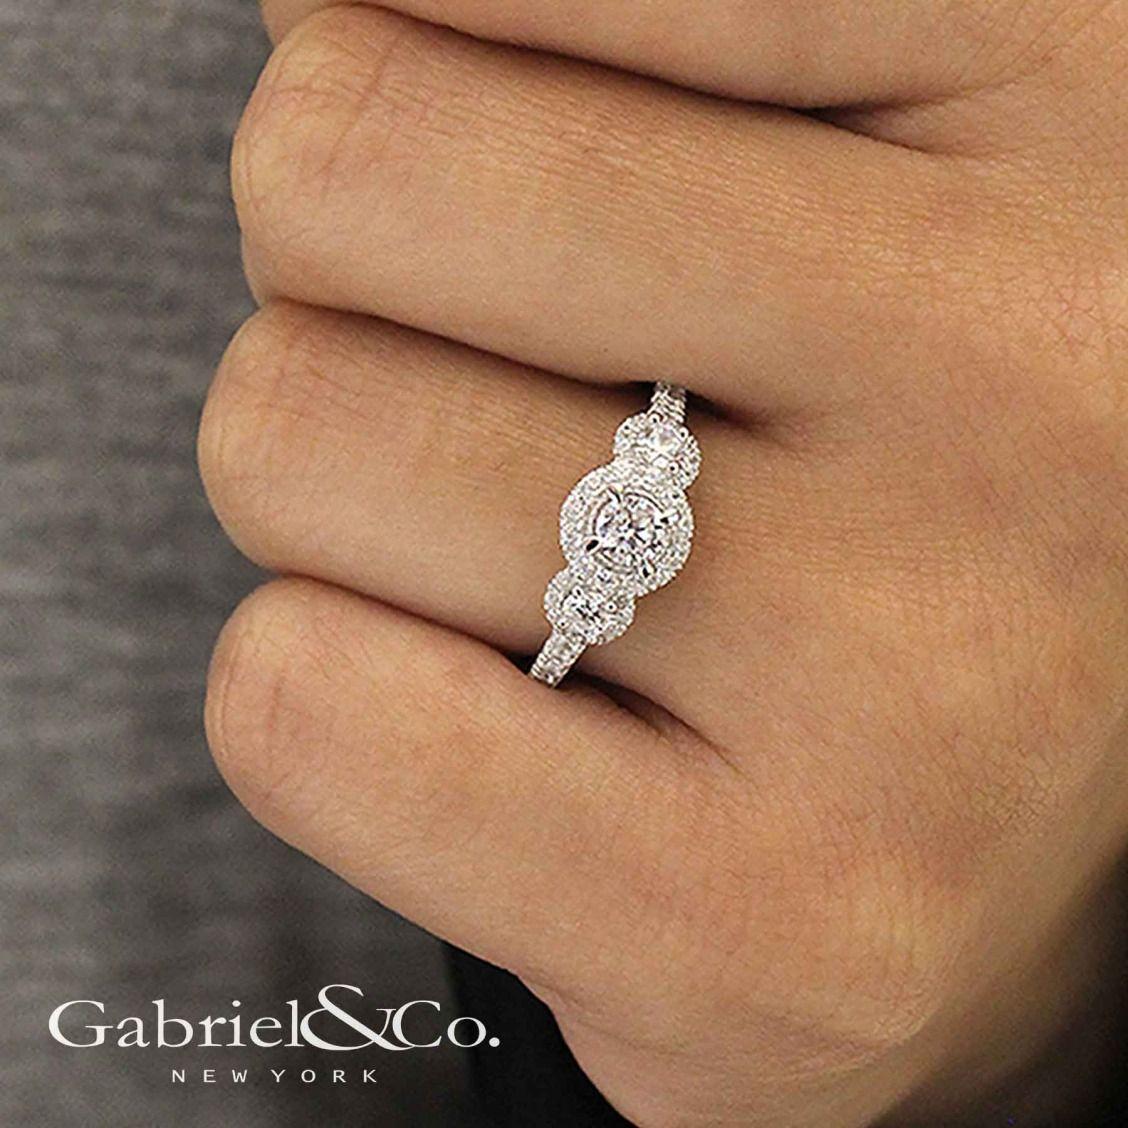 Gabriel Ny Preferred Fine Jewelry And Bridal Brand 14k